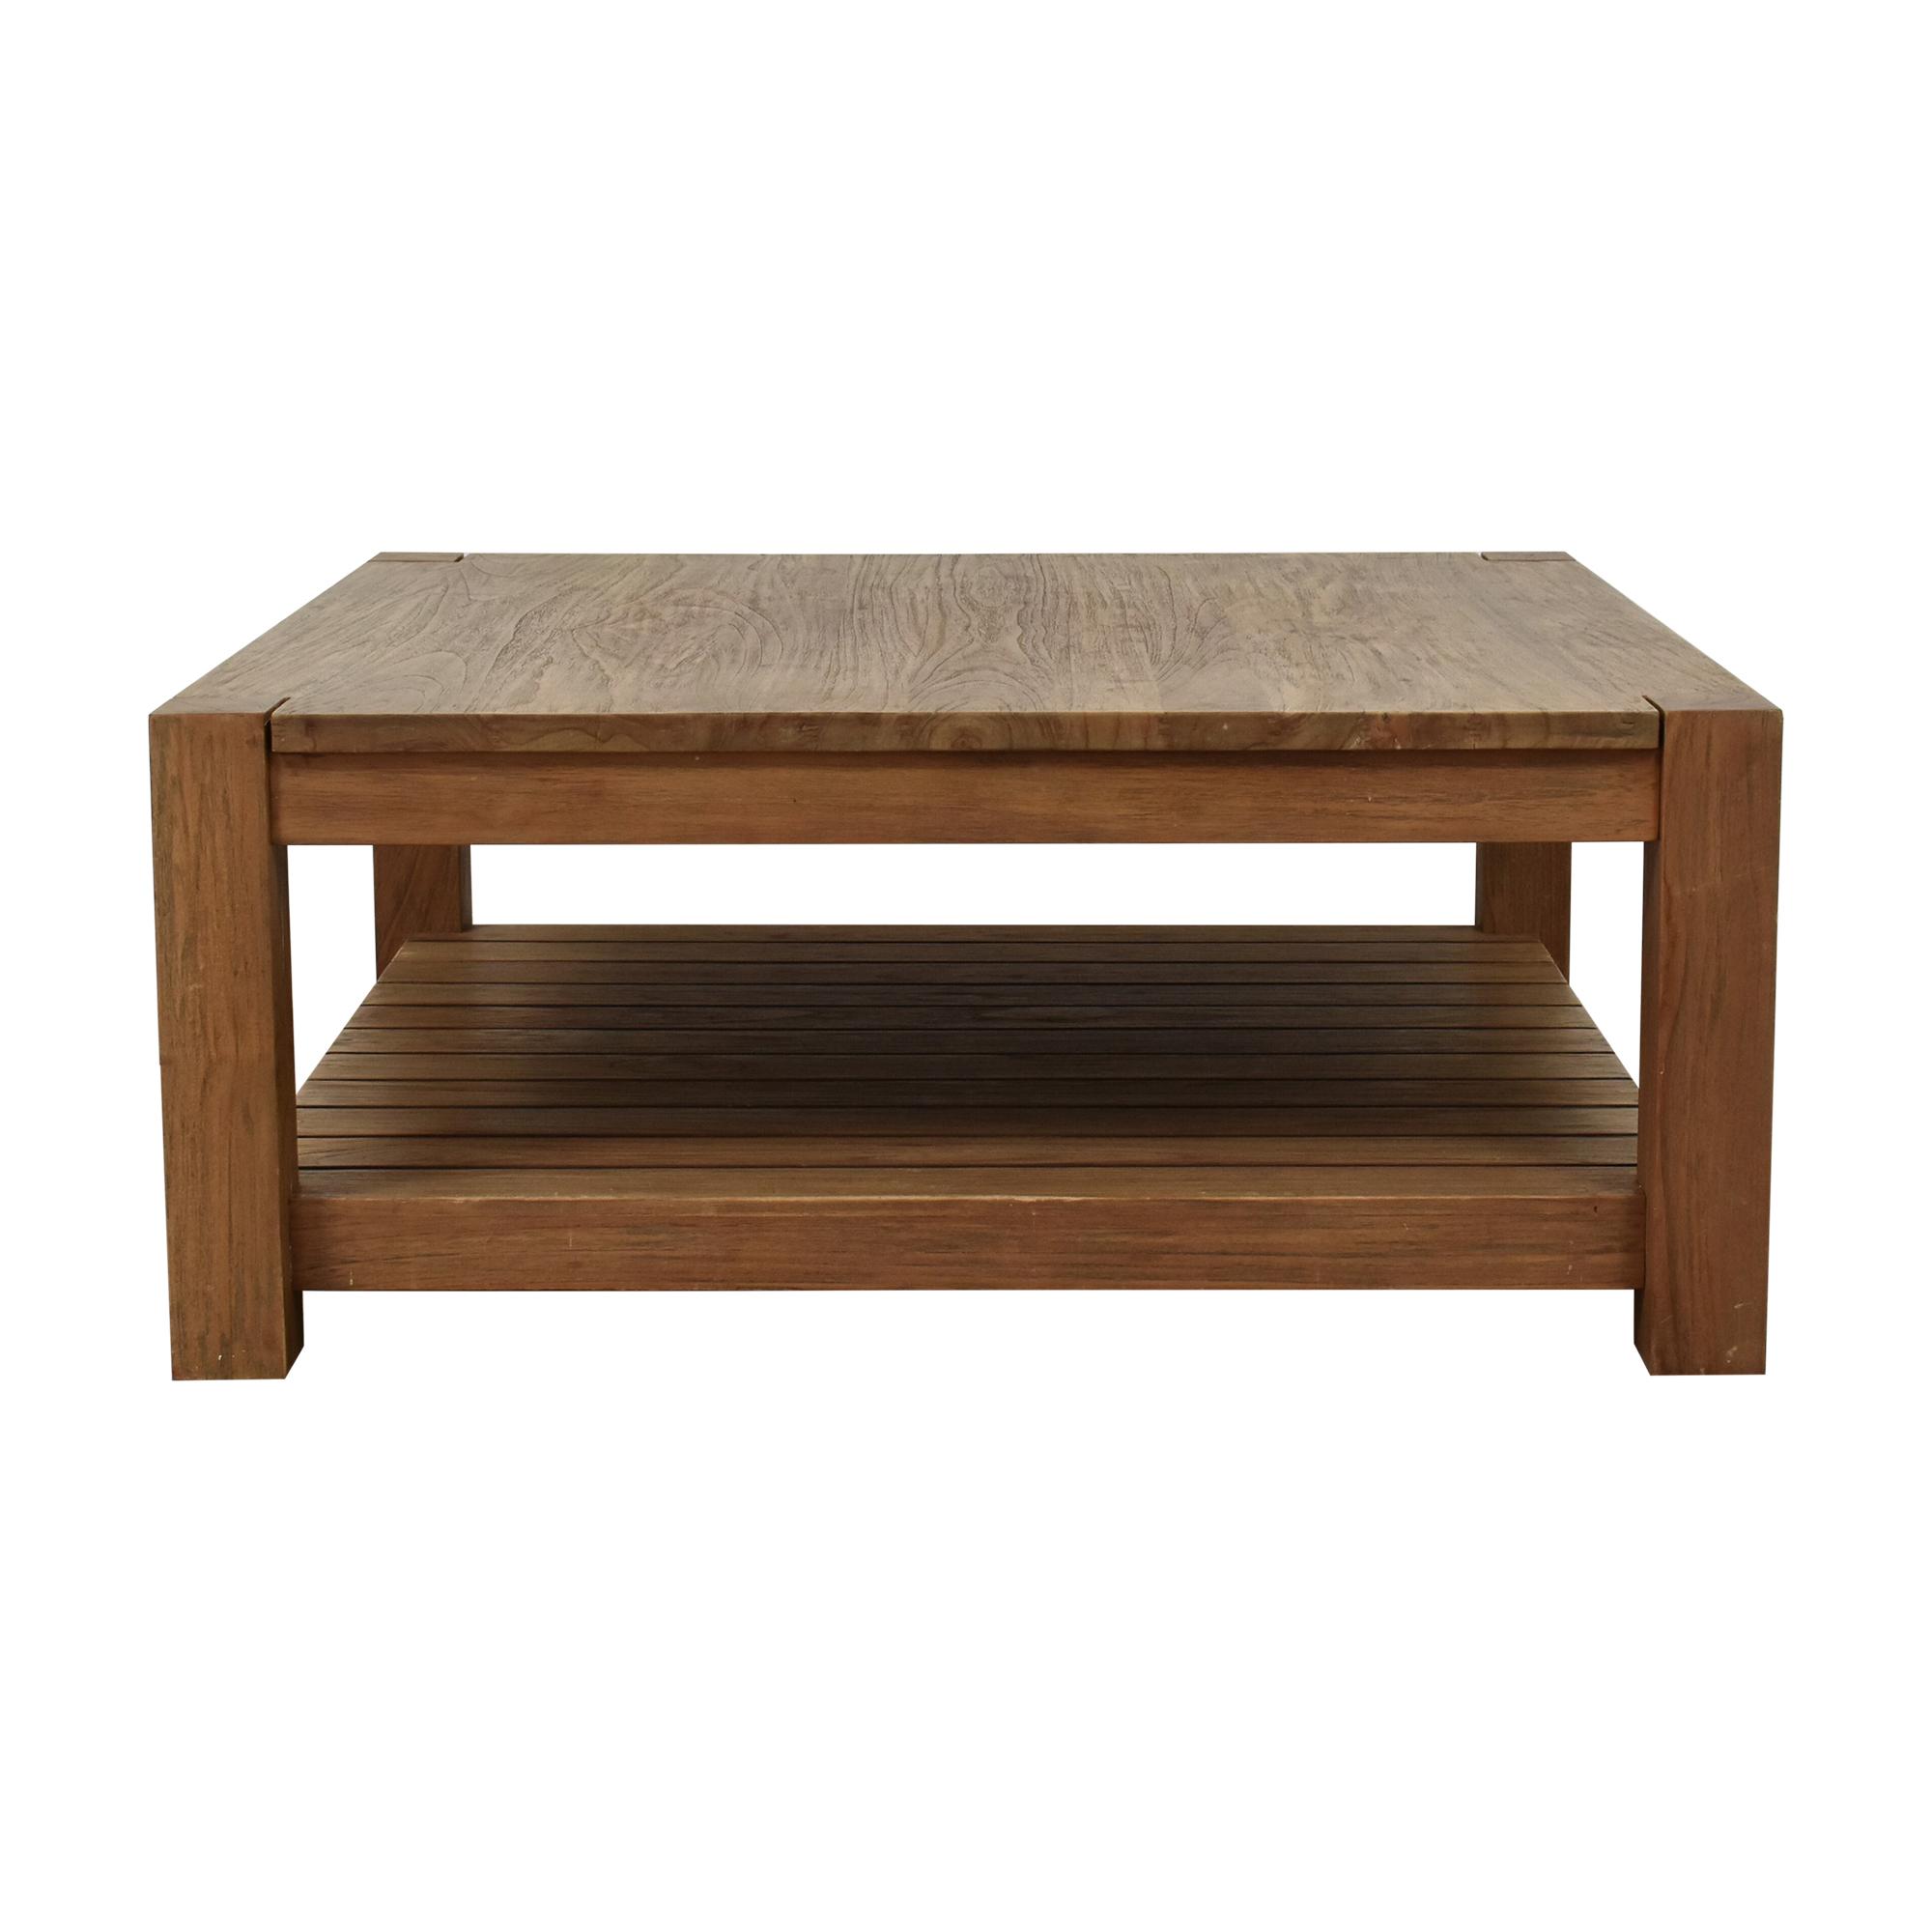 Crate & Barrel Crate & Barrel Edgewood Square Coffee Table ma